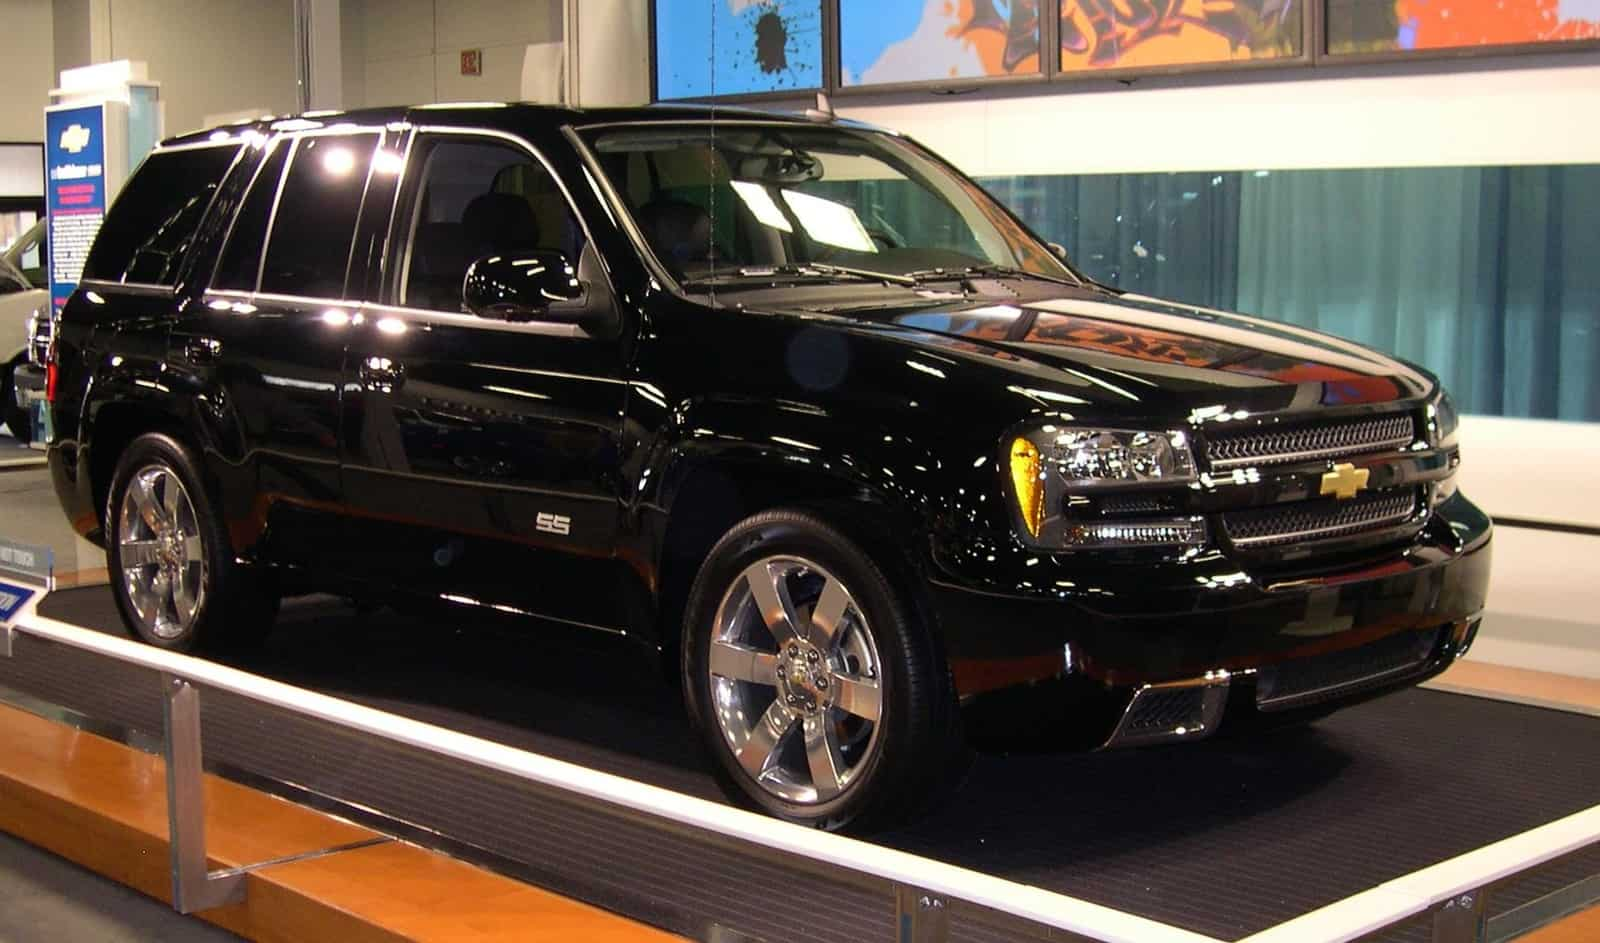 Find a Chevrolet TrailBlazer as cars under 5000